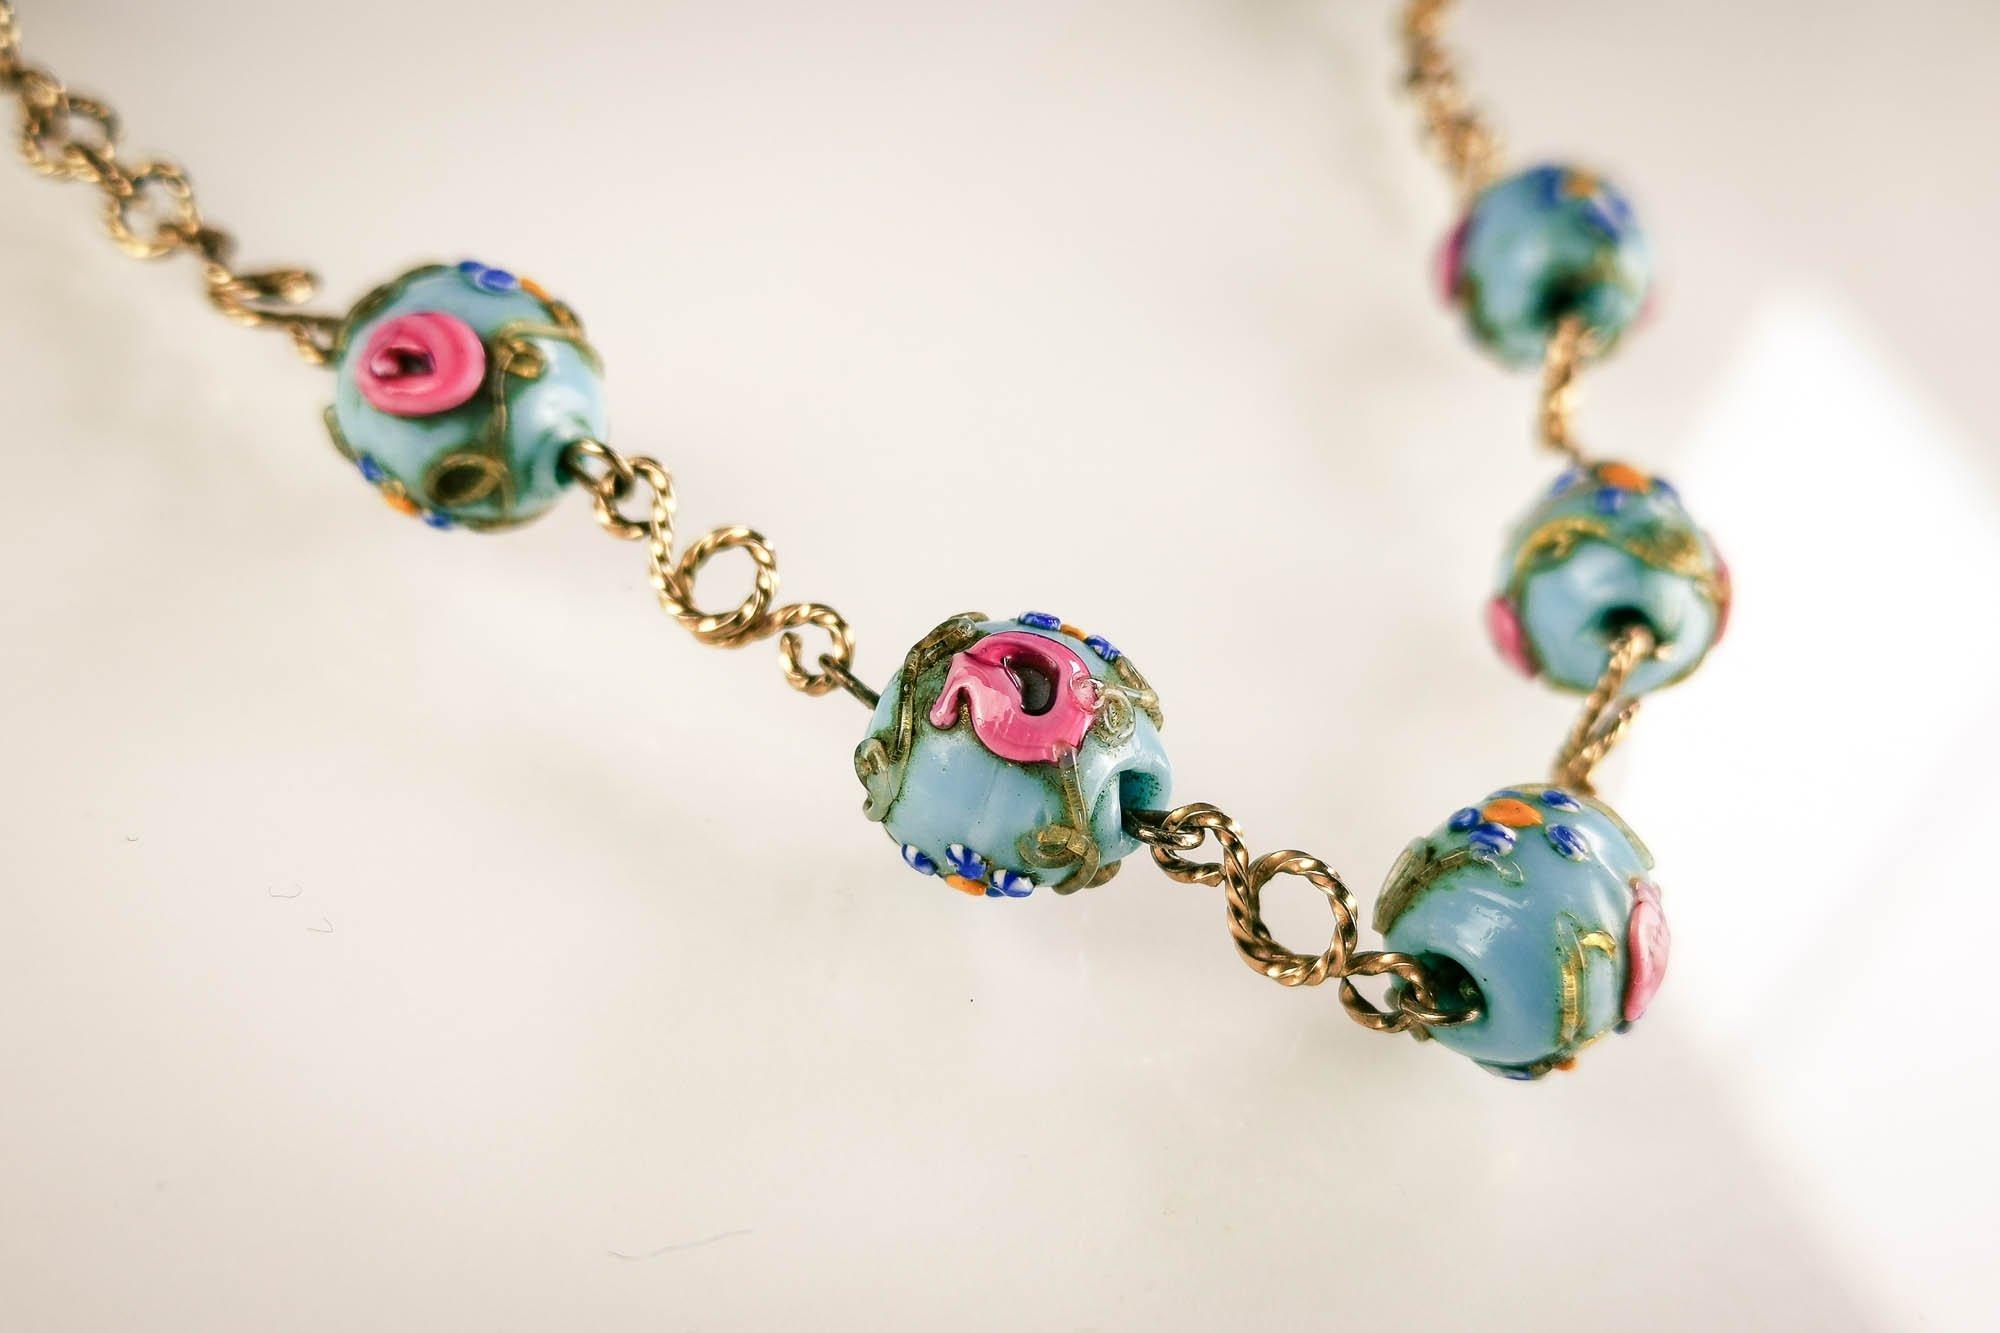 venetian wedding cake necklace